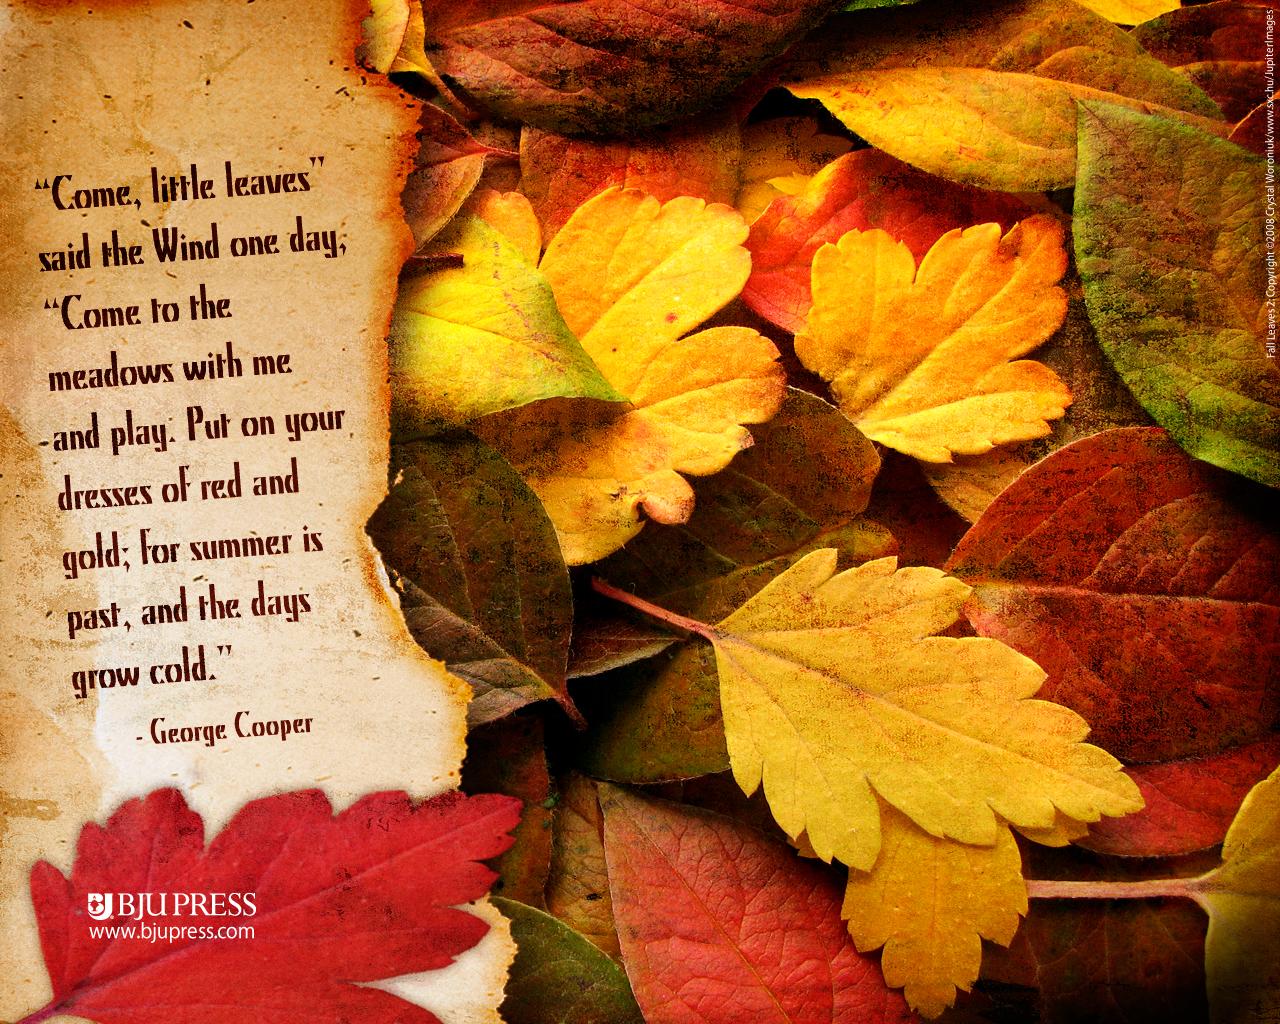 http://1.bp.blogspot.com/-B3RnO8SLSws/UEsEaZ8GA7I/AAAAAAAAATo/uxtg8r4QWJg/s1600/Autumn+Leaves+Wallpaper.jpg